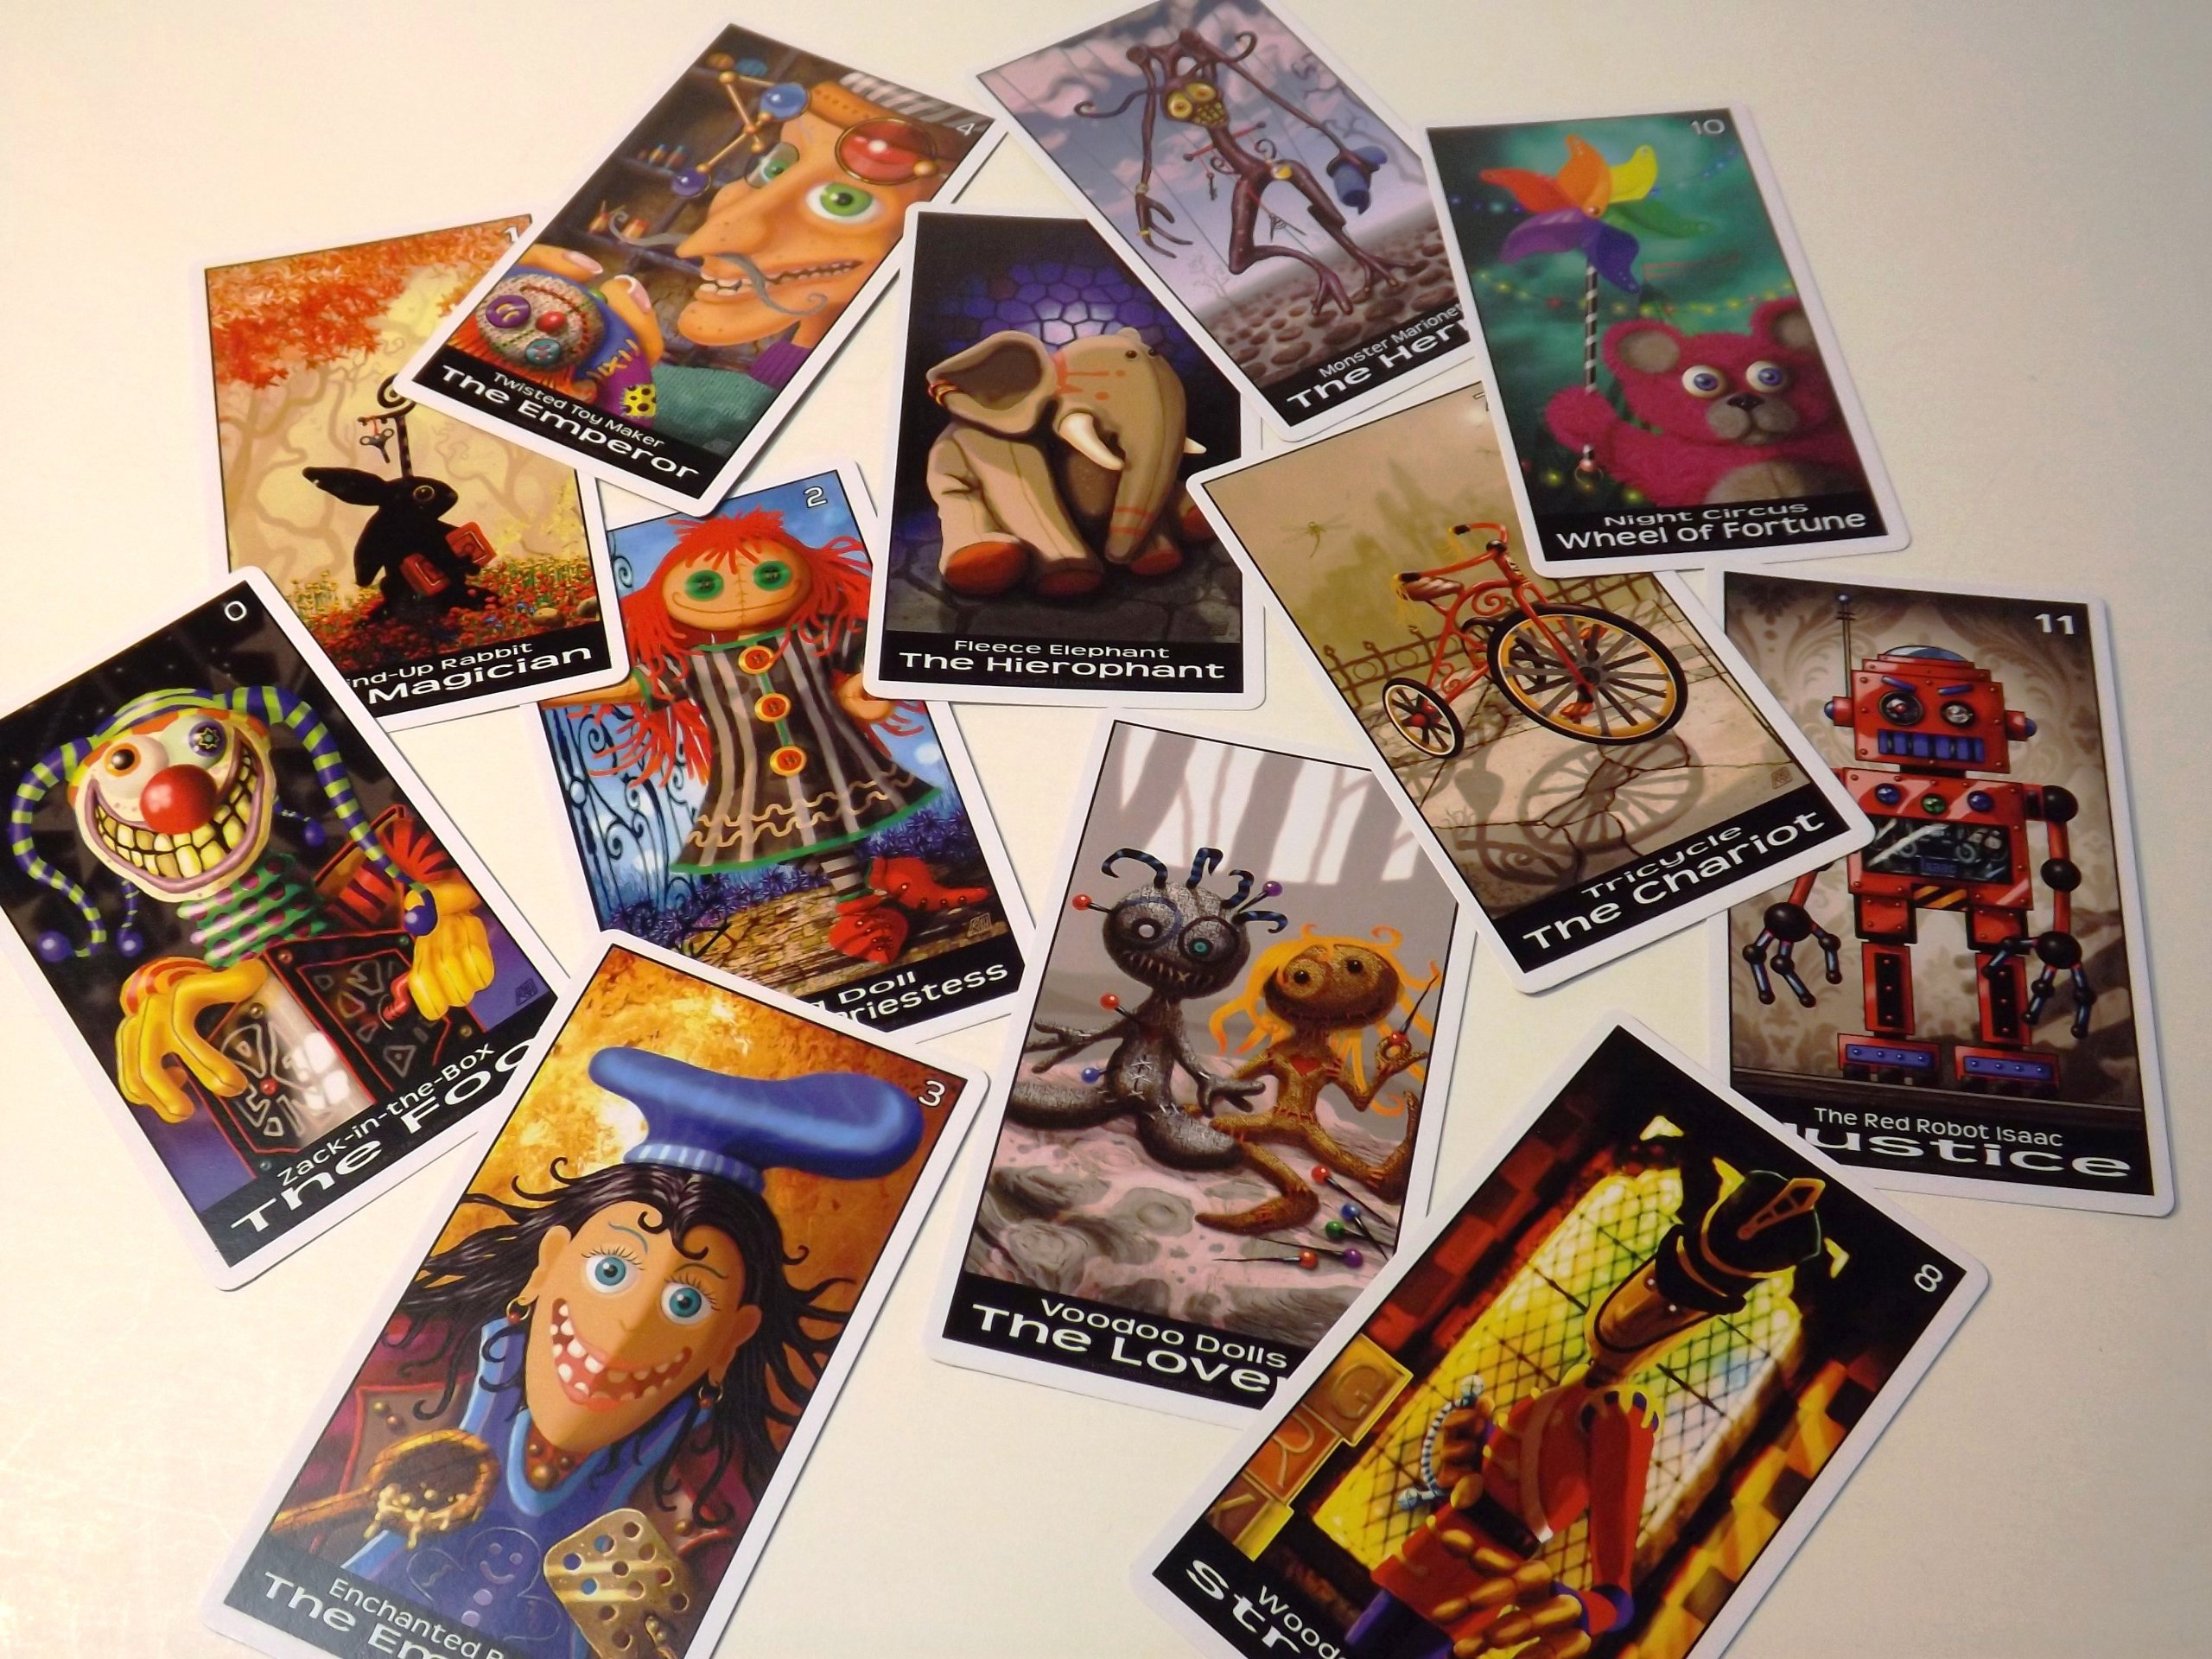 Twisted Toyland Tarot Cards - 22 Card Major Arcana Deck (With Handmade Tarot bag) by Oracles Forest Studios (Image #1)